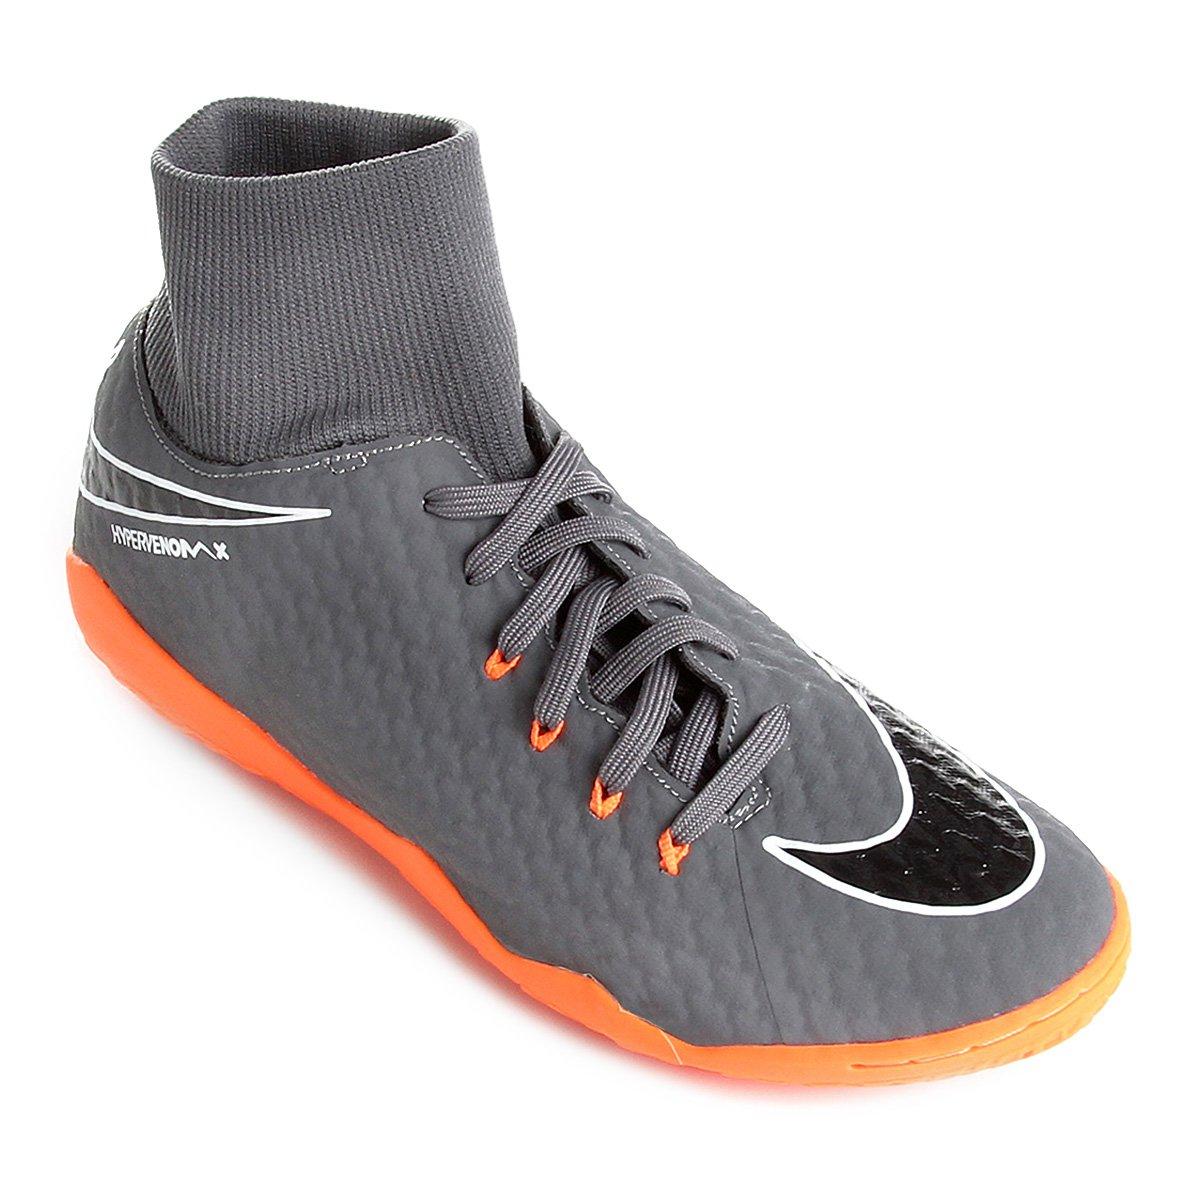 10cbe055d43d1 Chuteira Futsal Nike Hypervenom Phantom 3 Academy DF IC - Cinza e Laranja -  Compre Agora